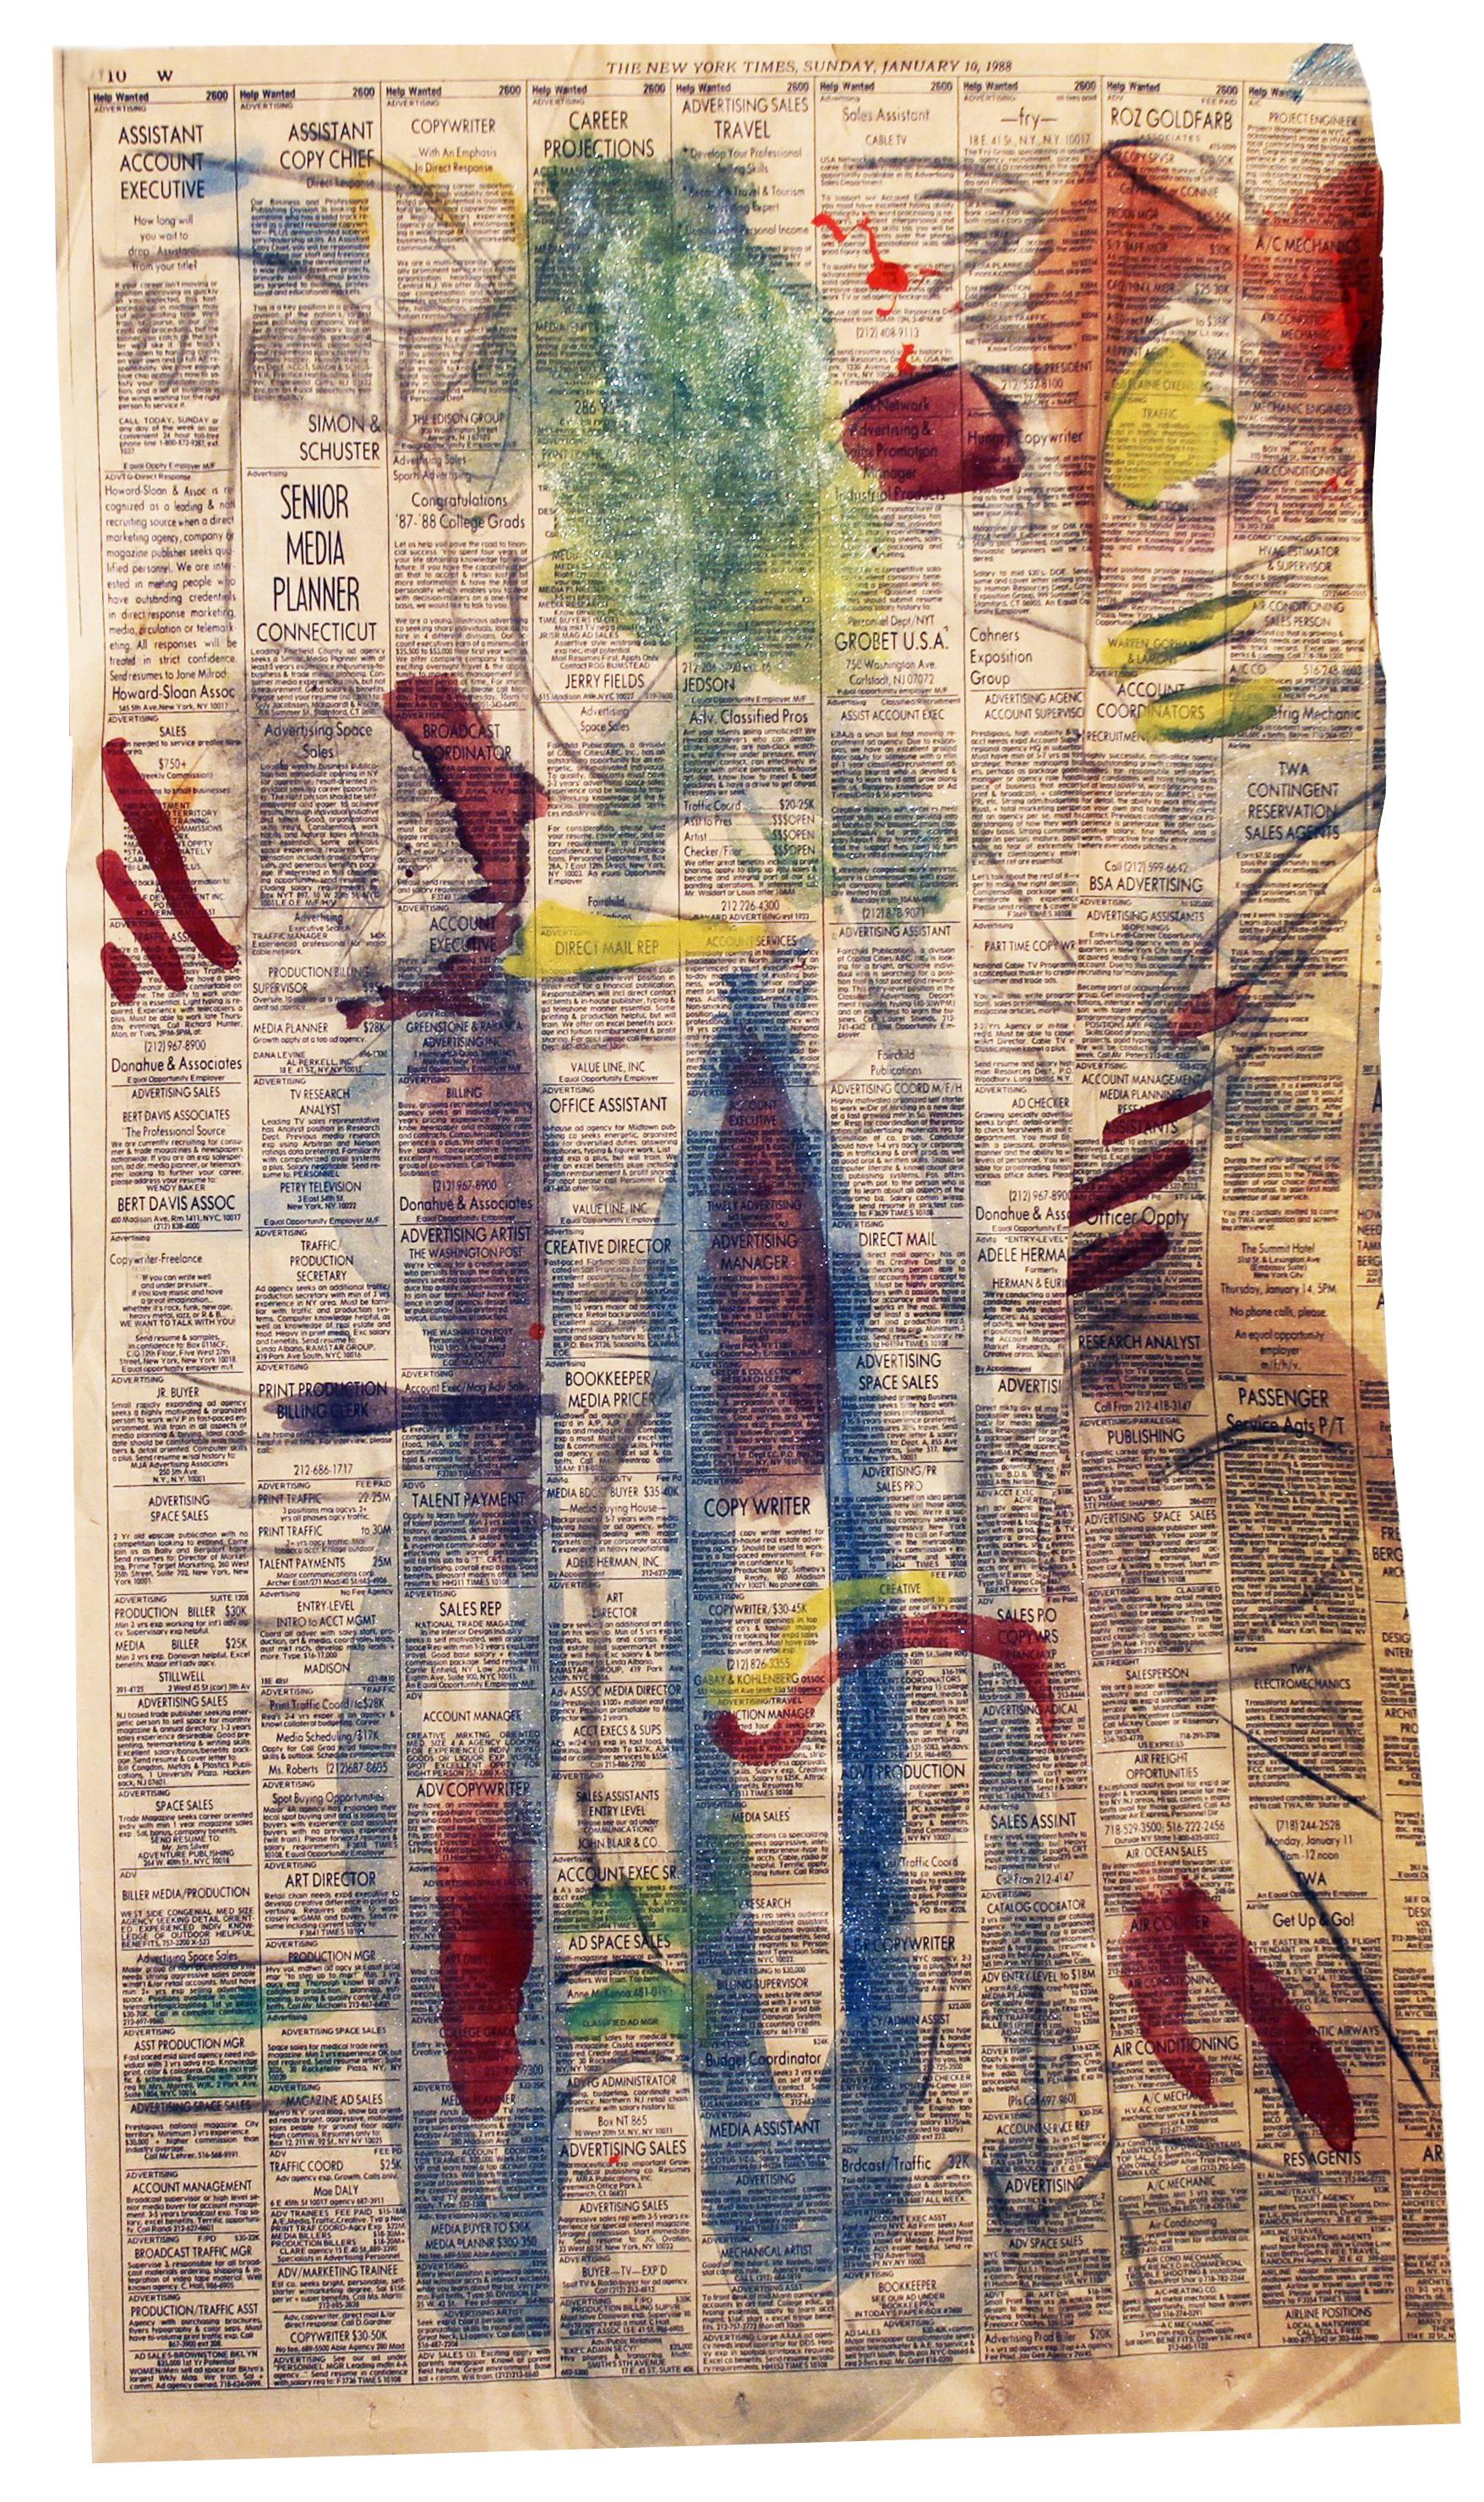 YouGotItMixedMediaOnPaper22x12inches - Joe Ginsberg_ArtModernny.jpg